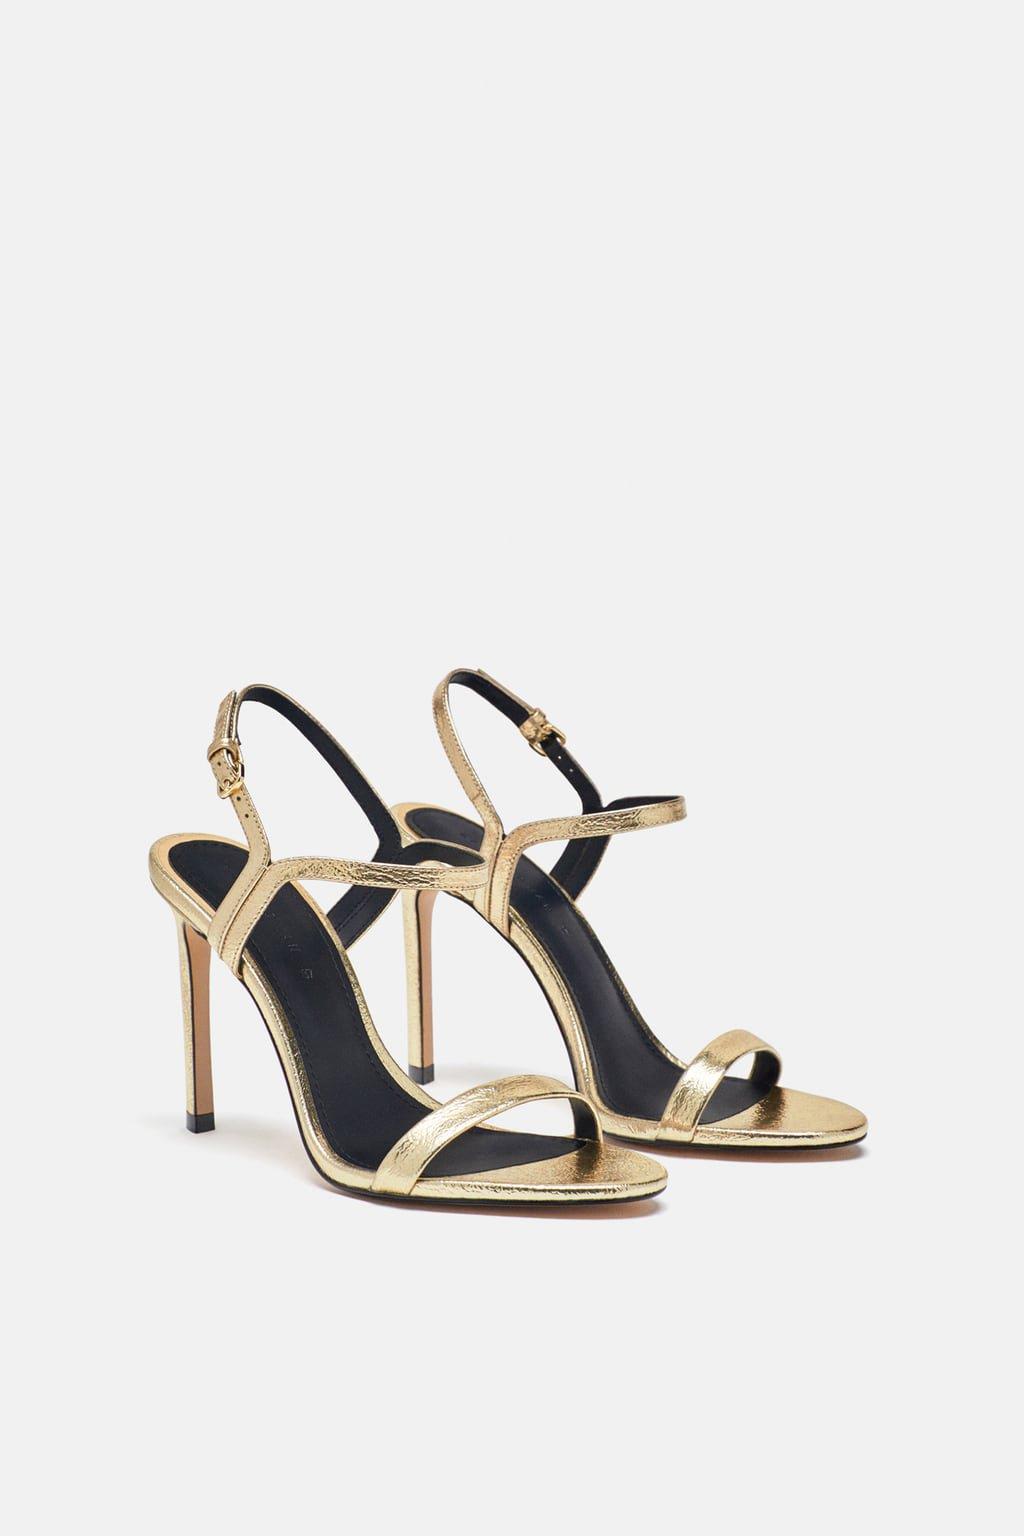 SANDALIA TIRA FINA - Party Shoes-ZAPATOS-MUJER | ZARA España